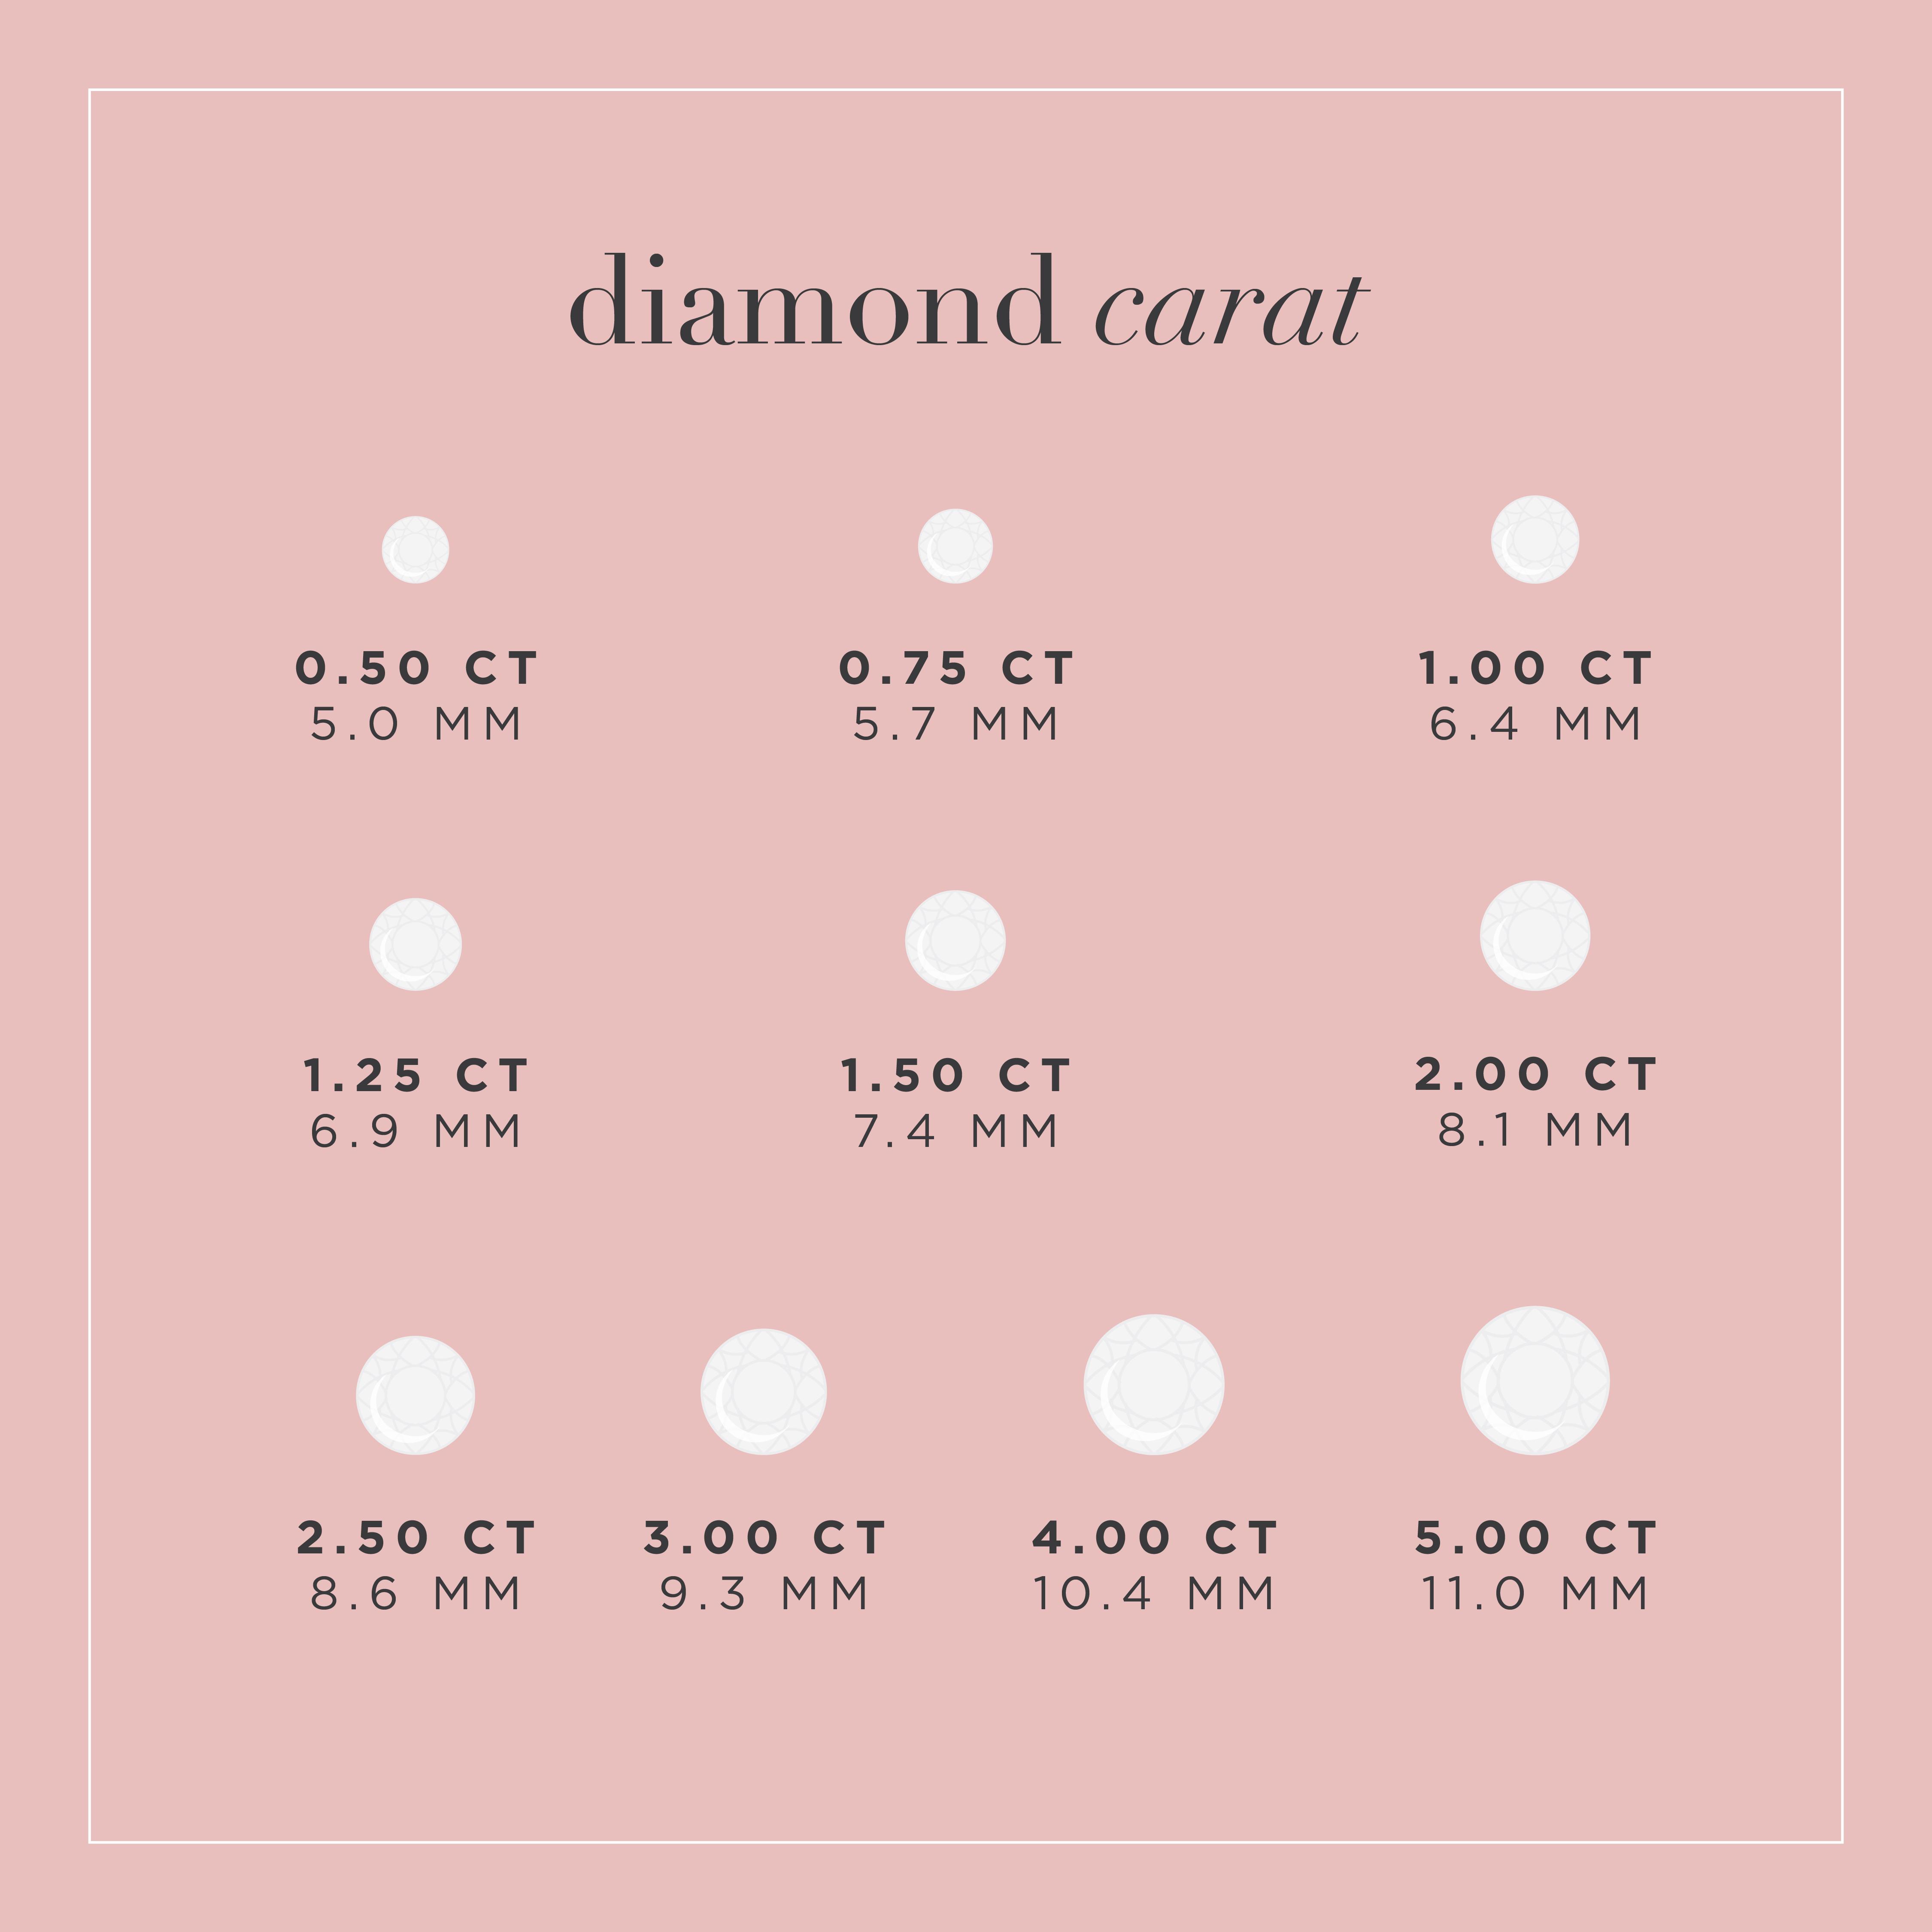 diamond carat guide